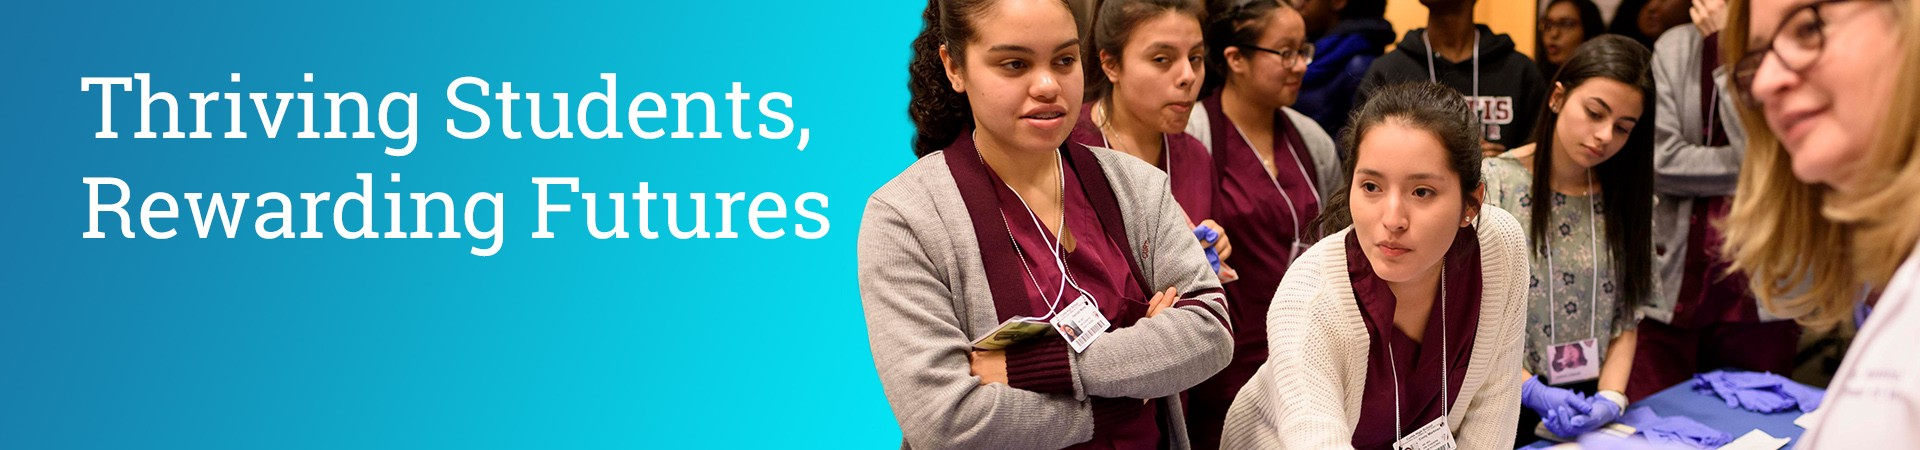 Thriving Students, Rewarding Futures